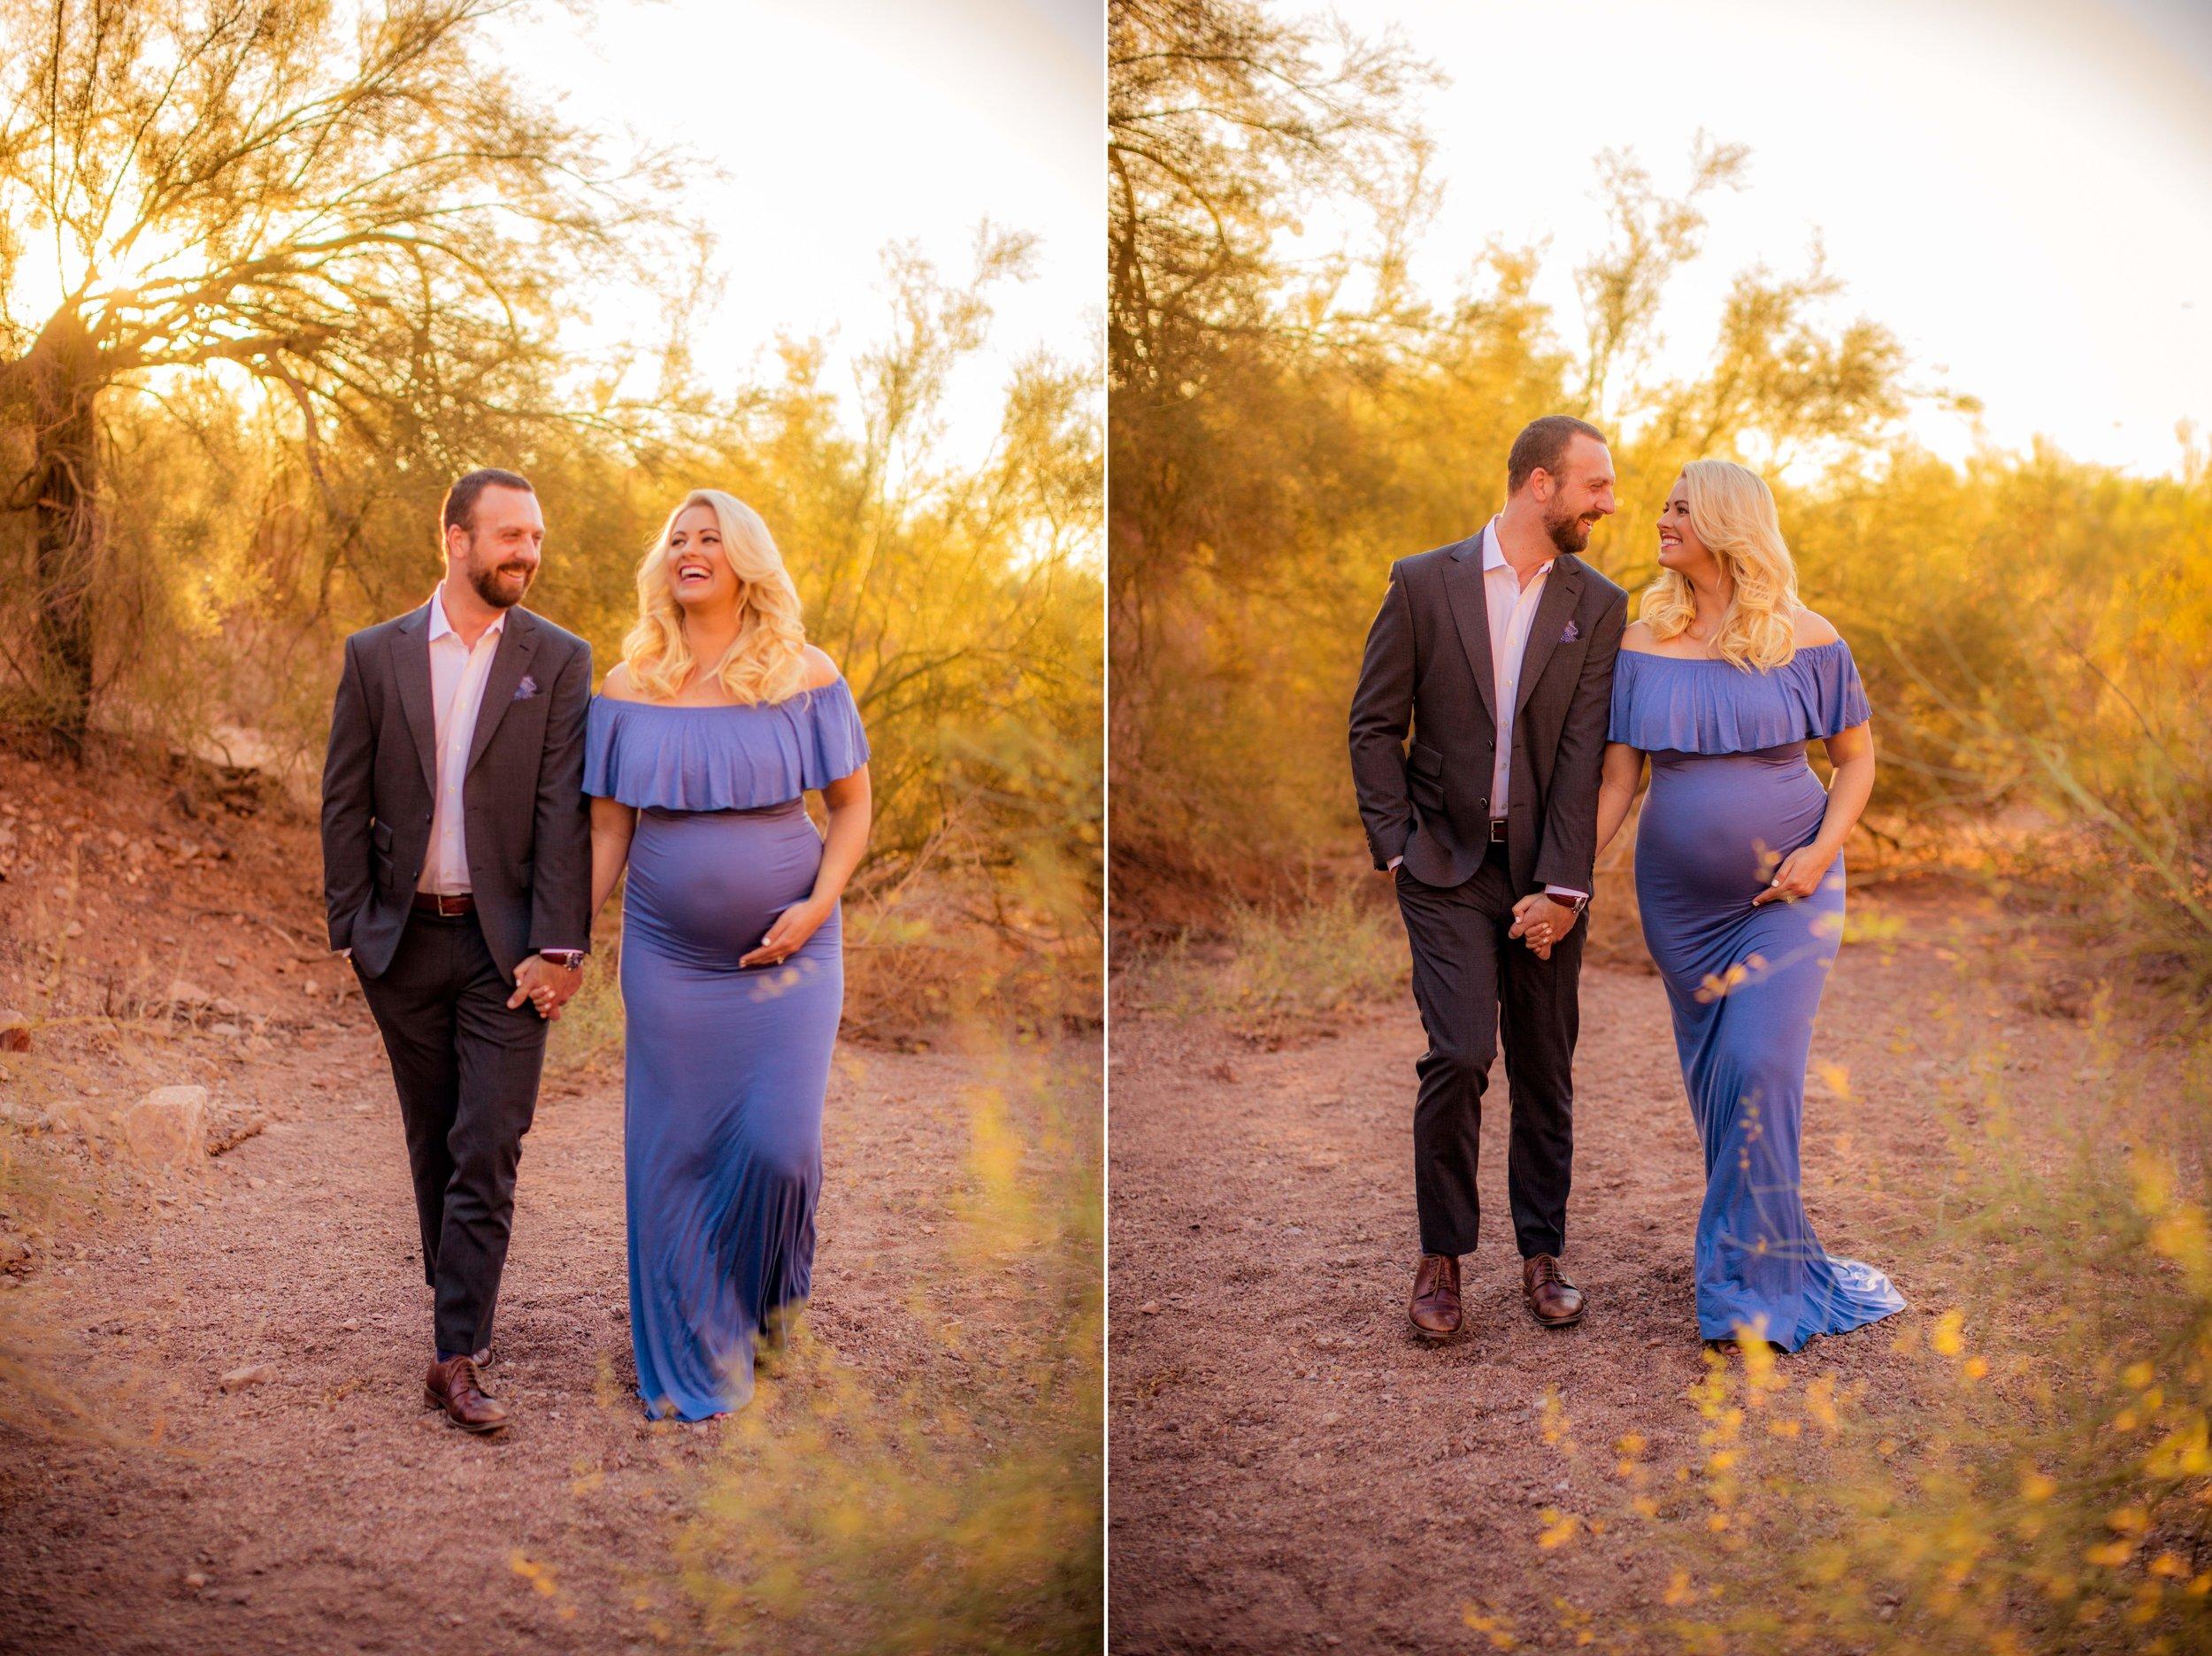 -colorado-wedding-photographer-denver-springs-vail-607A0034 copy.jpeg